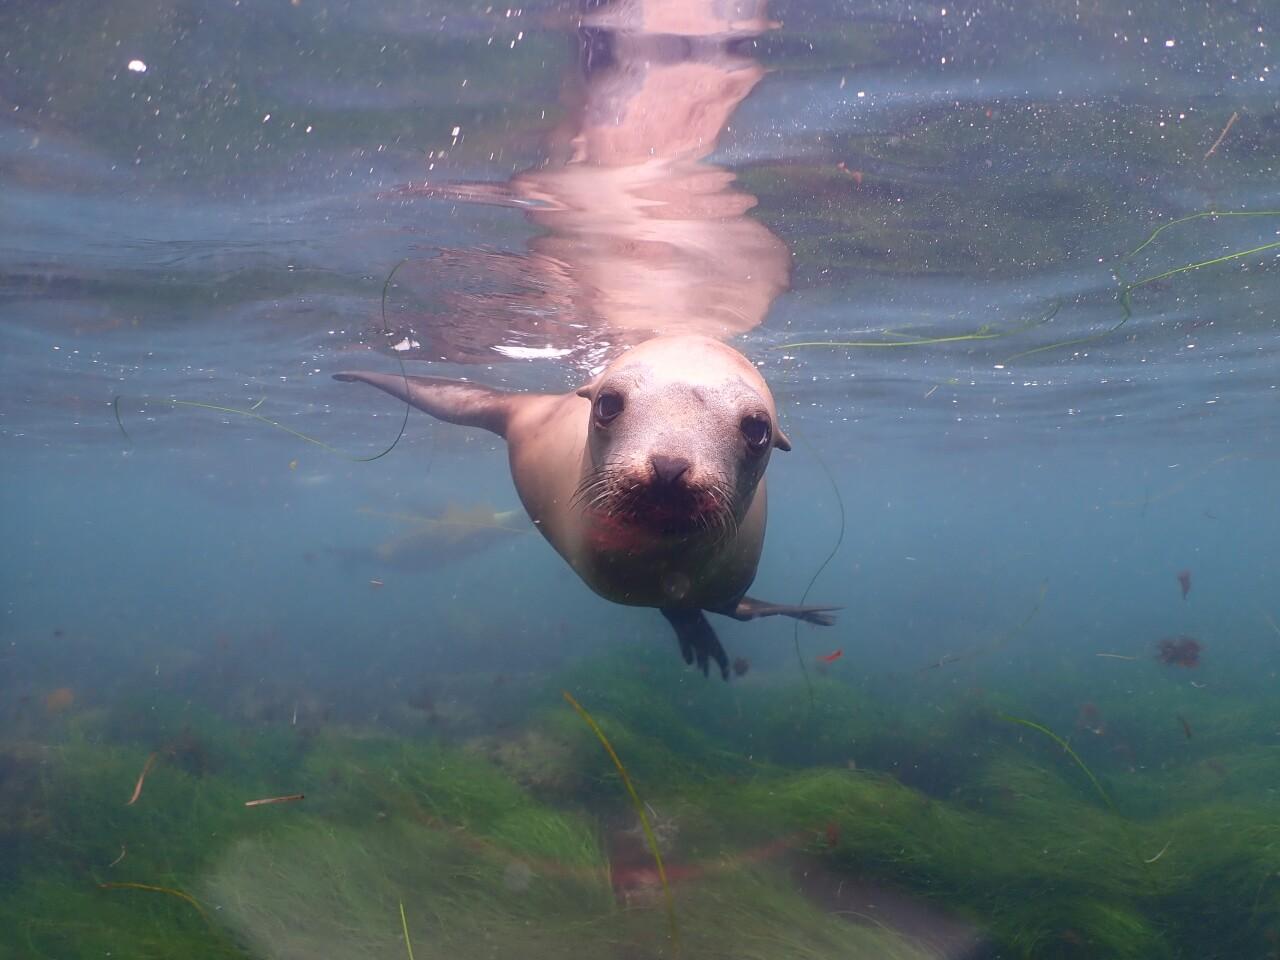 A curious sea lion greets Sarah McTague as she snorkels at La Jolla Cove.